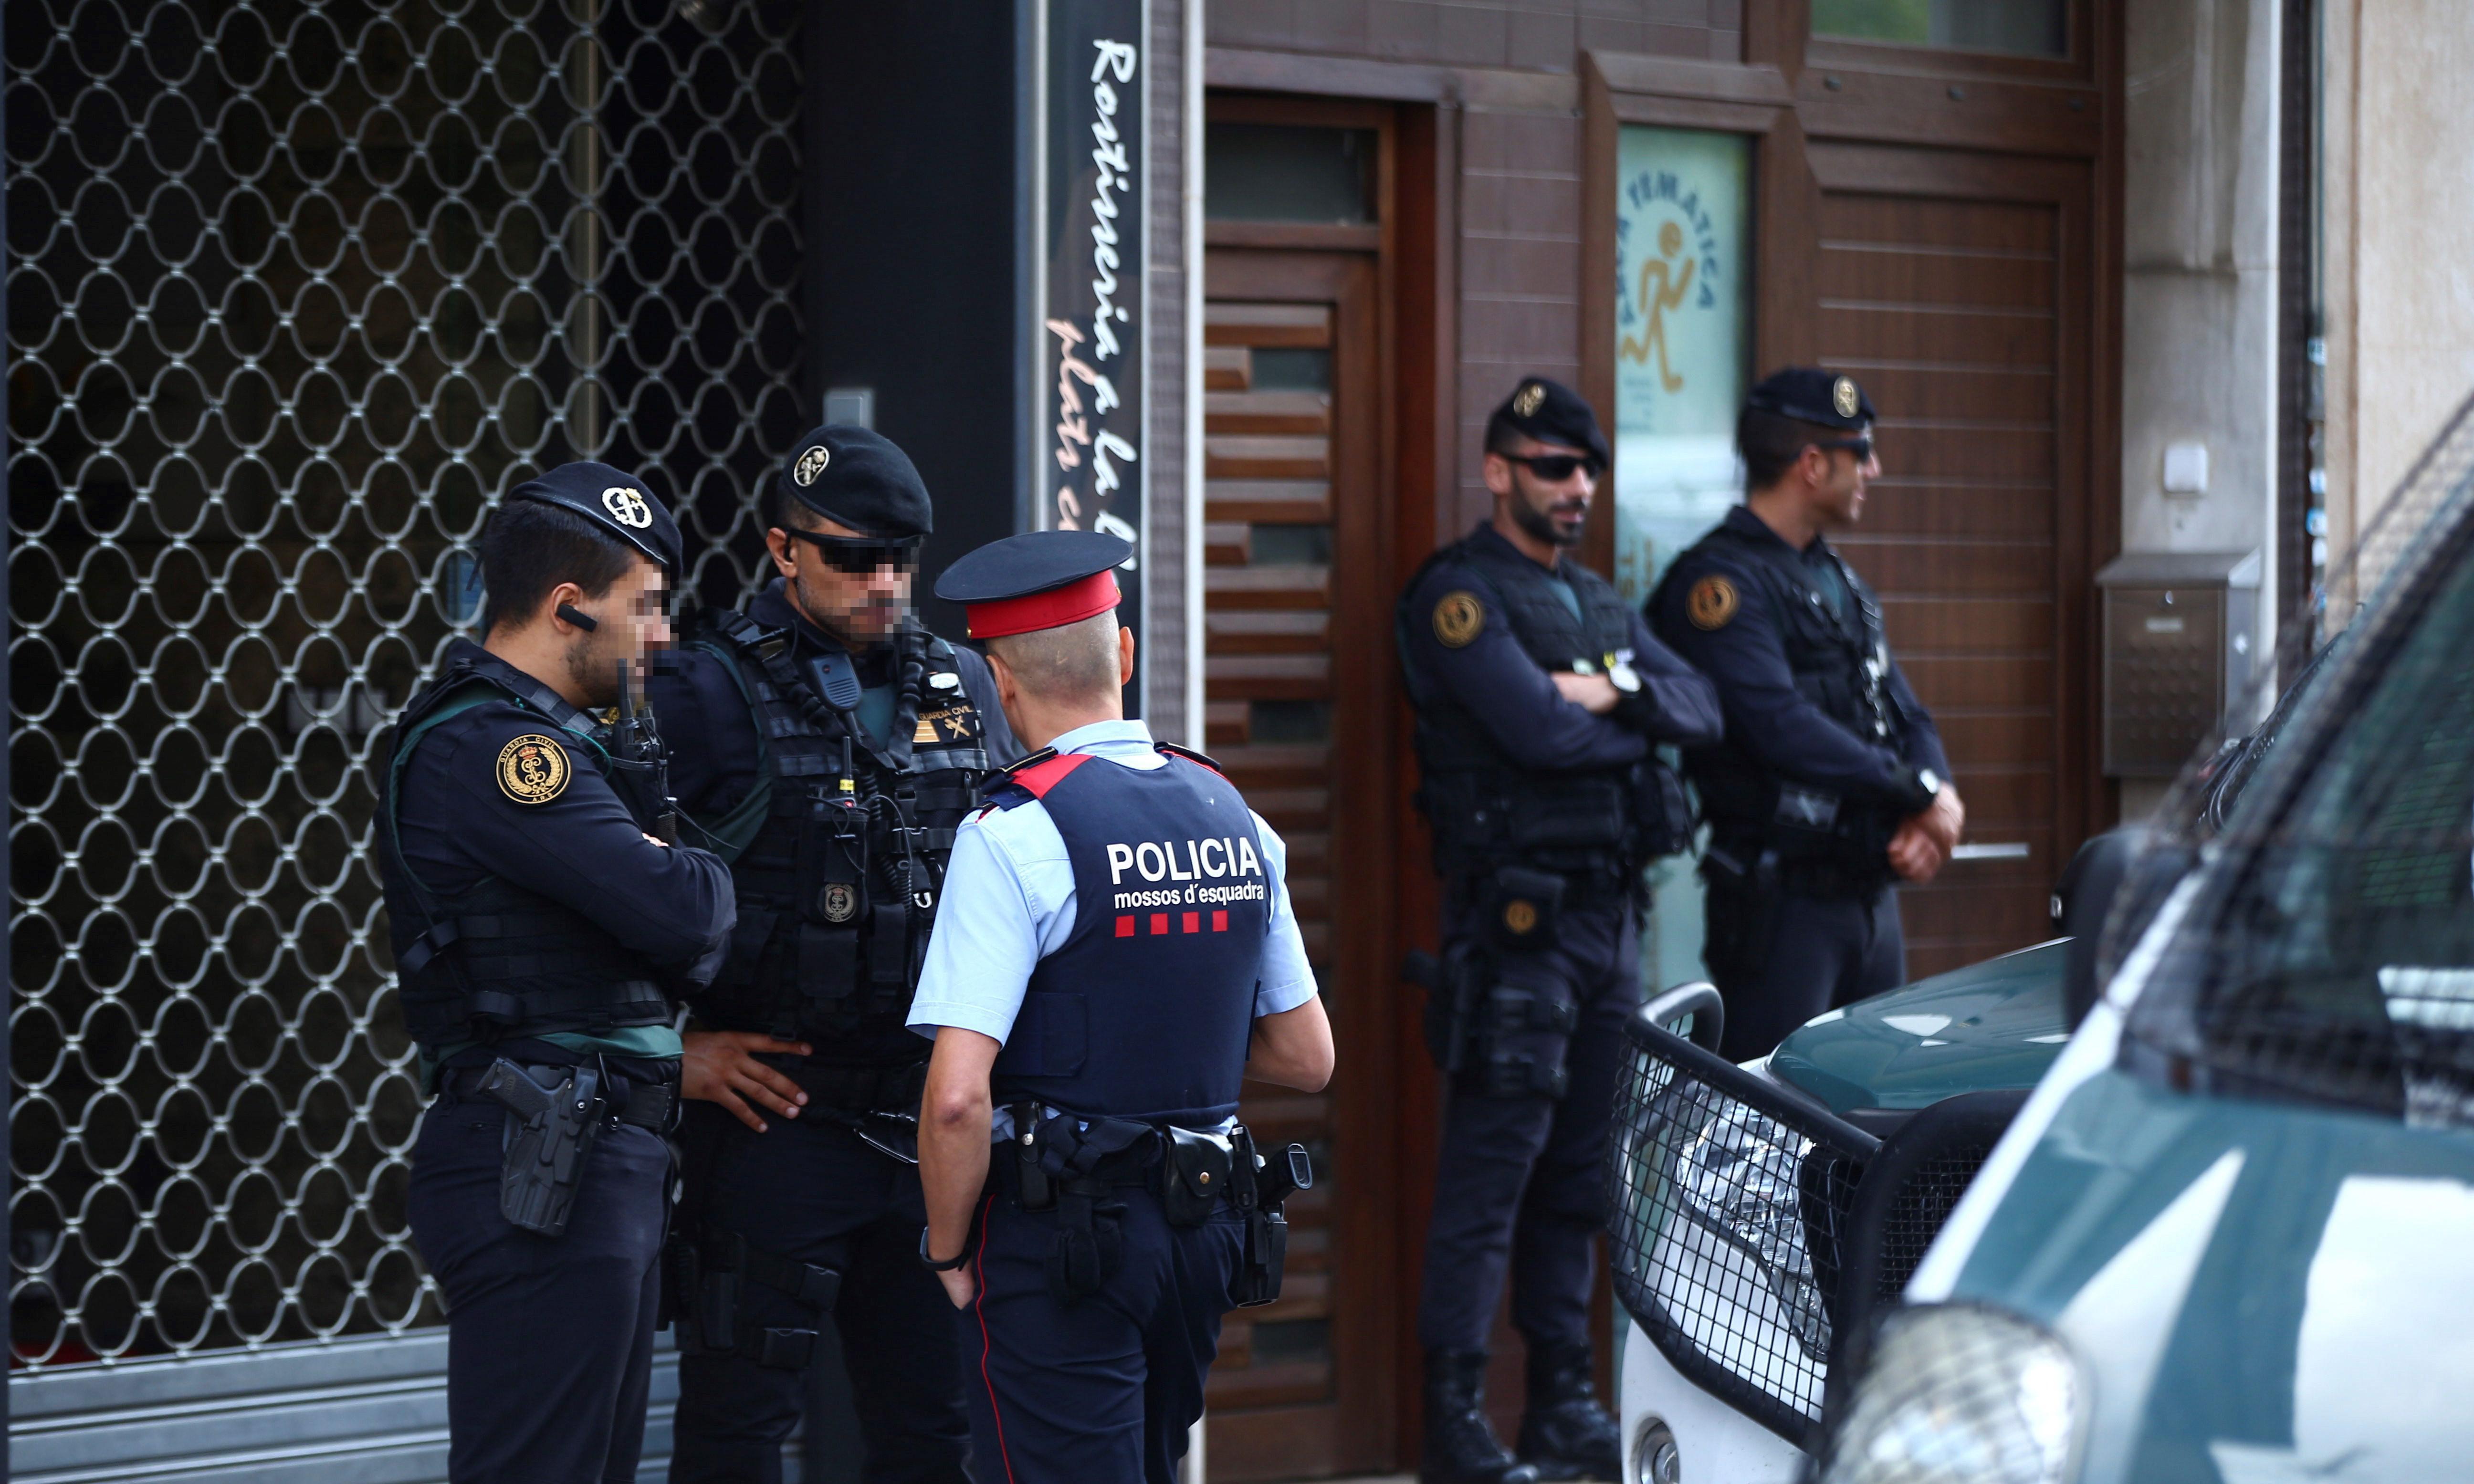 Spanish police arrest Catalan separatists on suspicion of terrorism